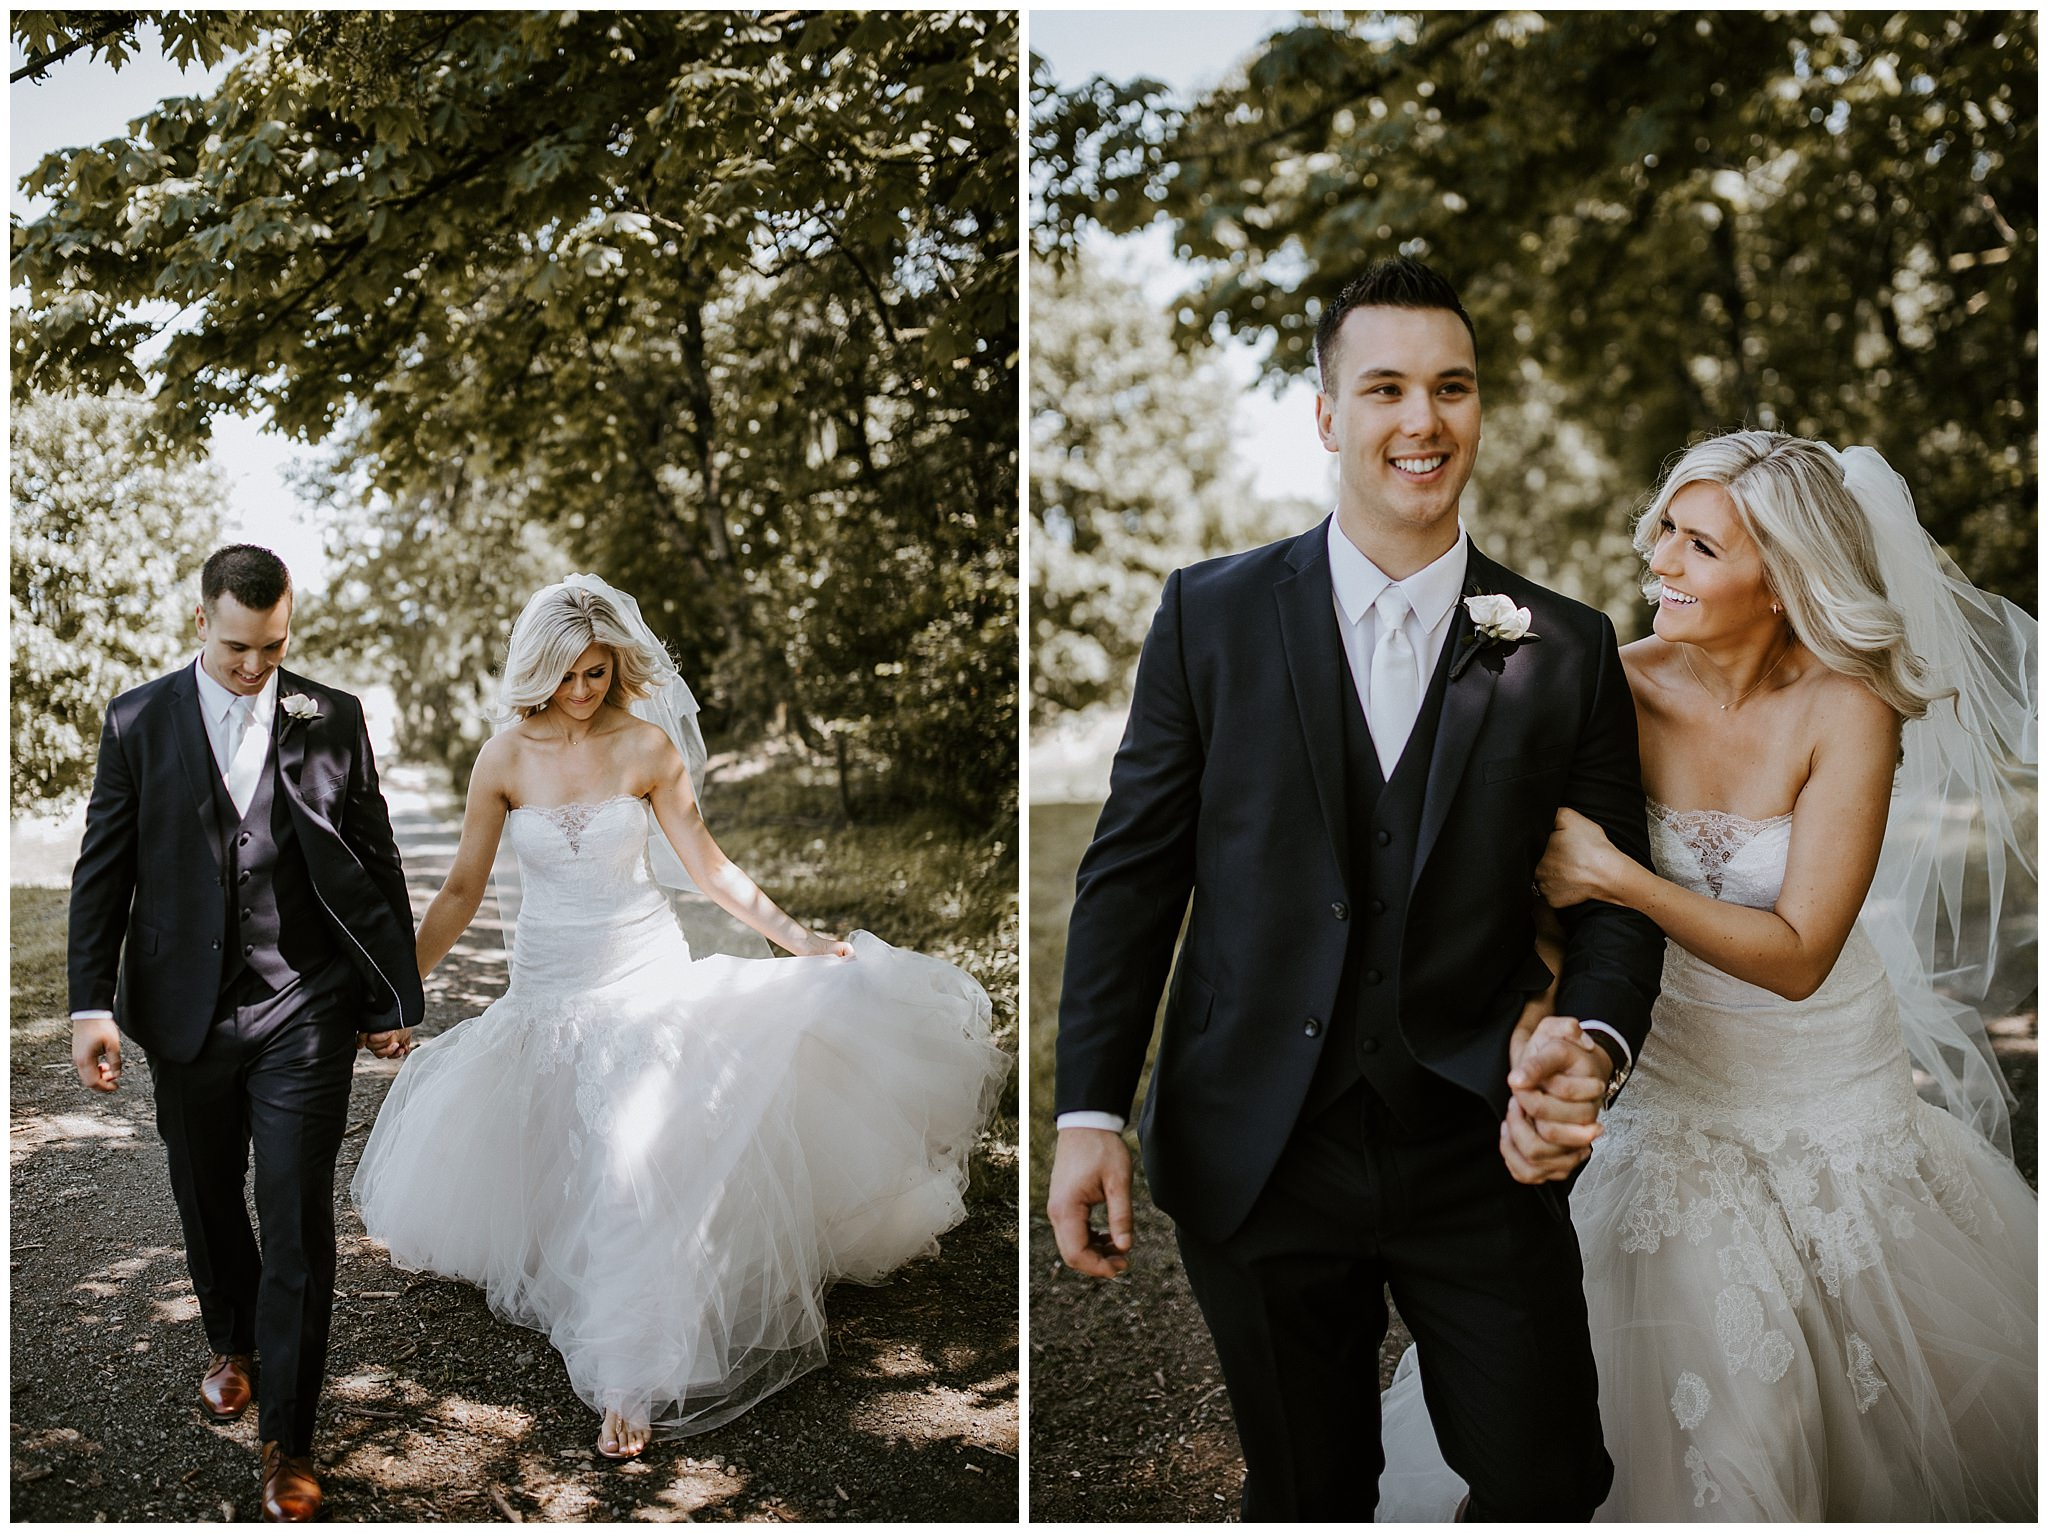 mt-lehman-winery-wedding-abbotsford-26.JPG